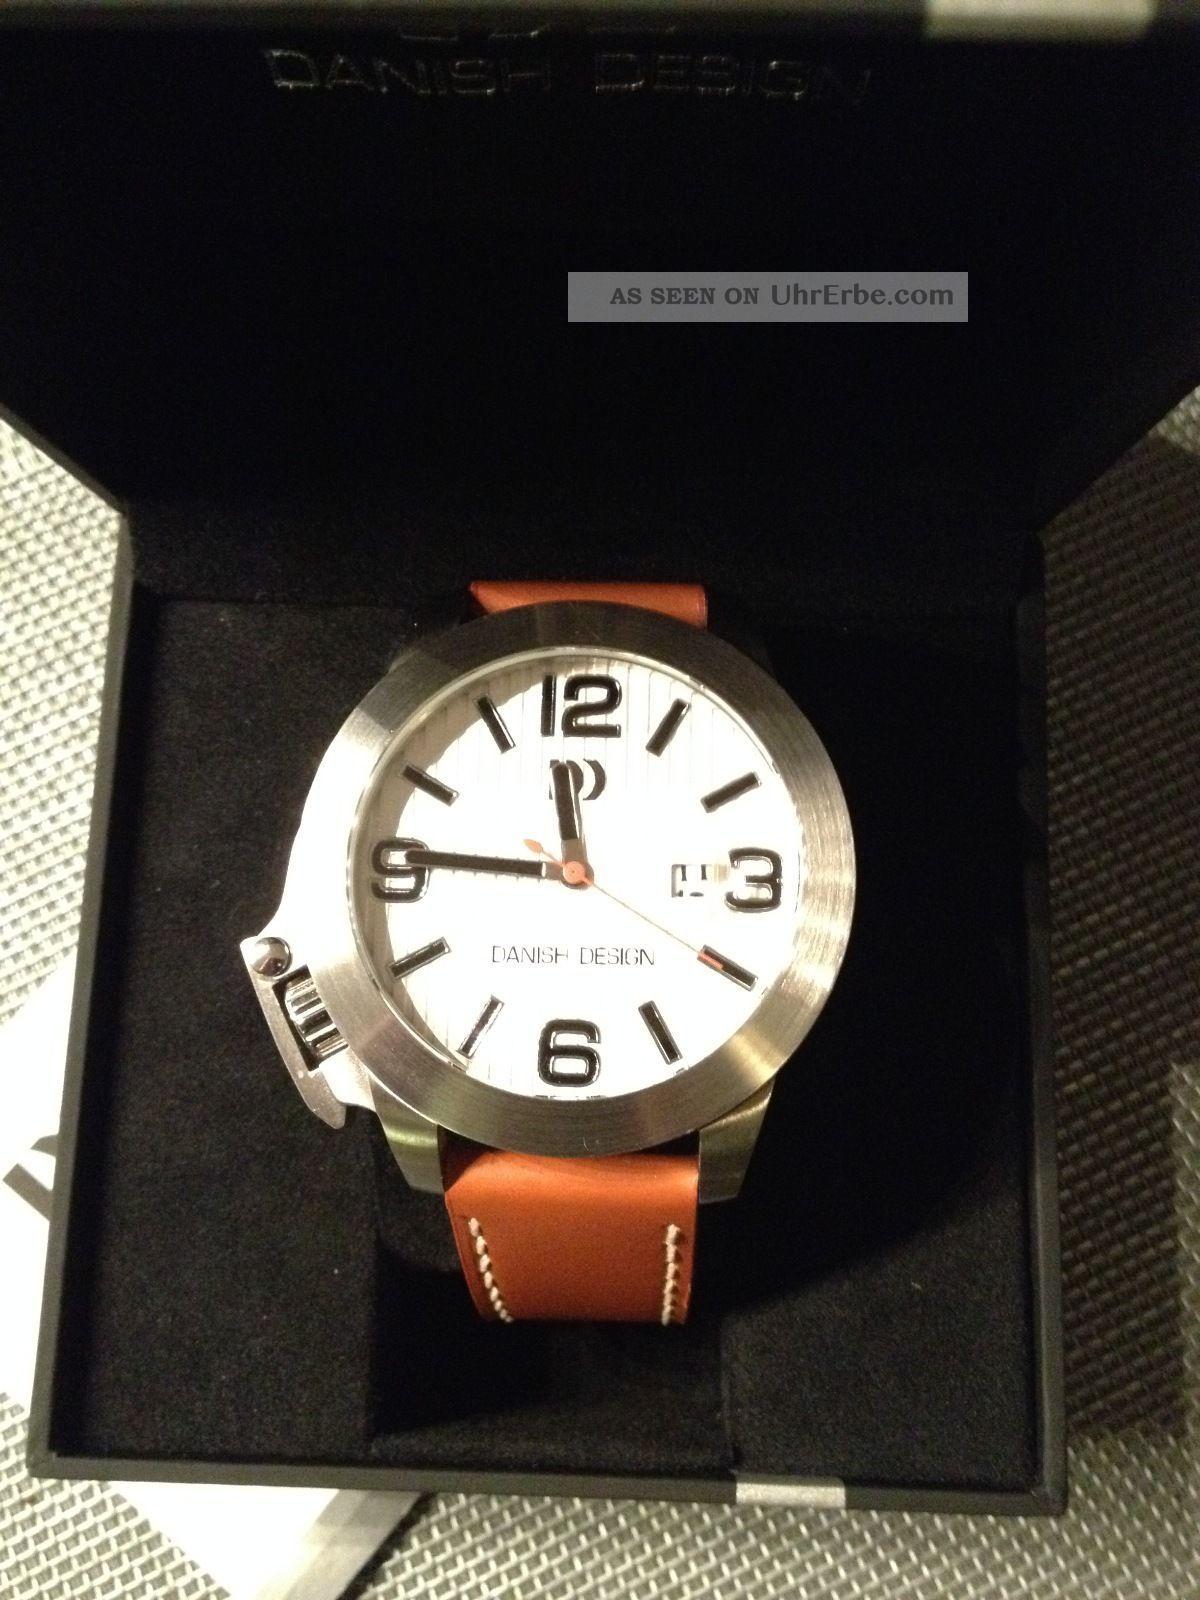 Danish Design Quarz Herrenarmbanduhr Uhr Iq12q915 Mit Datumsanzeige (lupe) Armbanduhren Bild